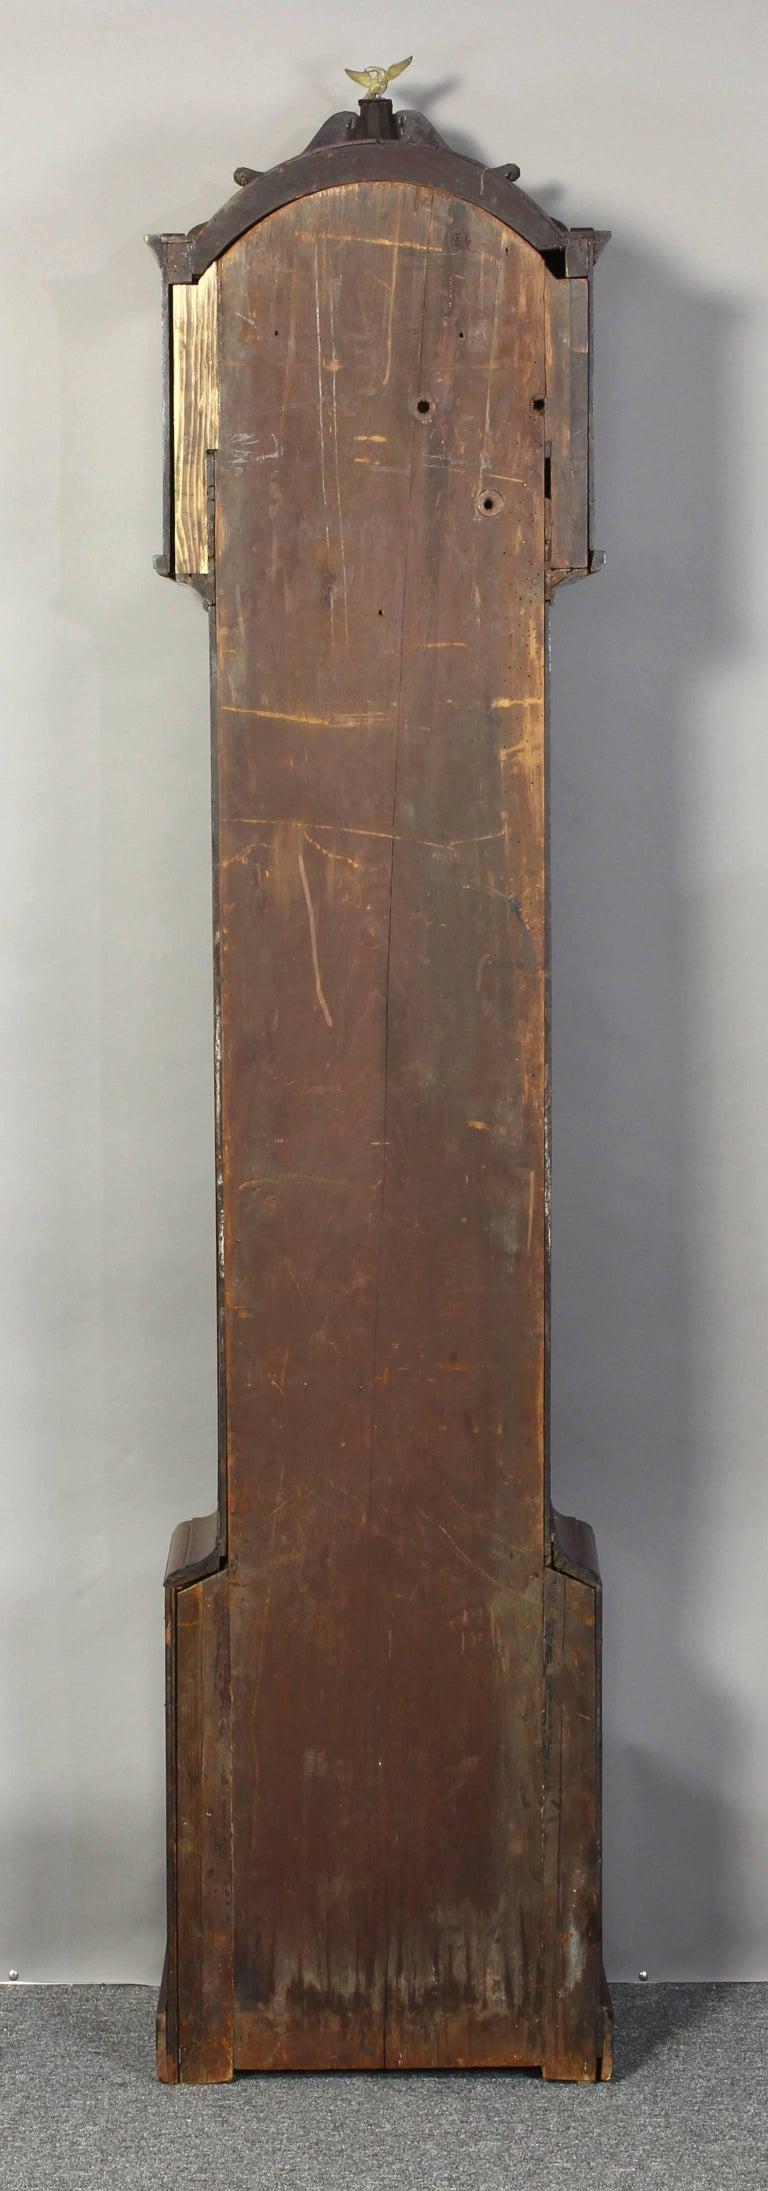 Irish Regency Eight Day Tall Case Clock 3